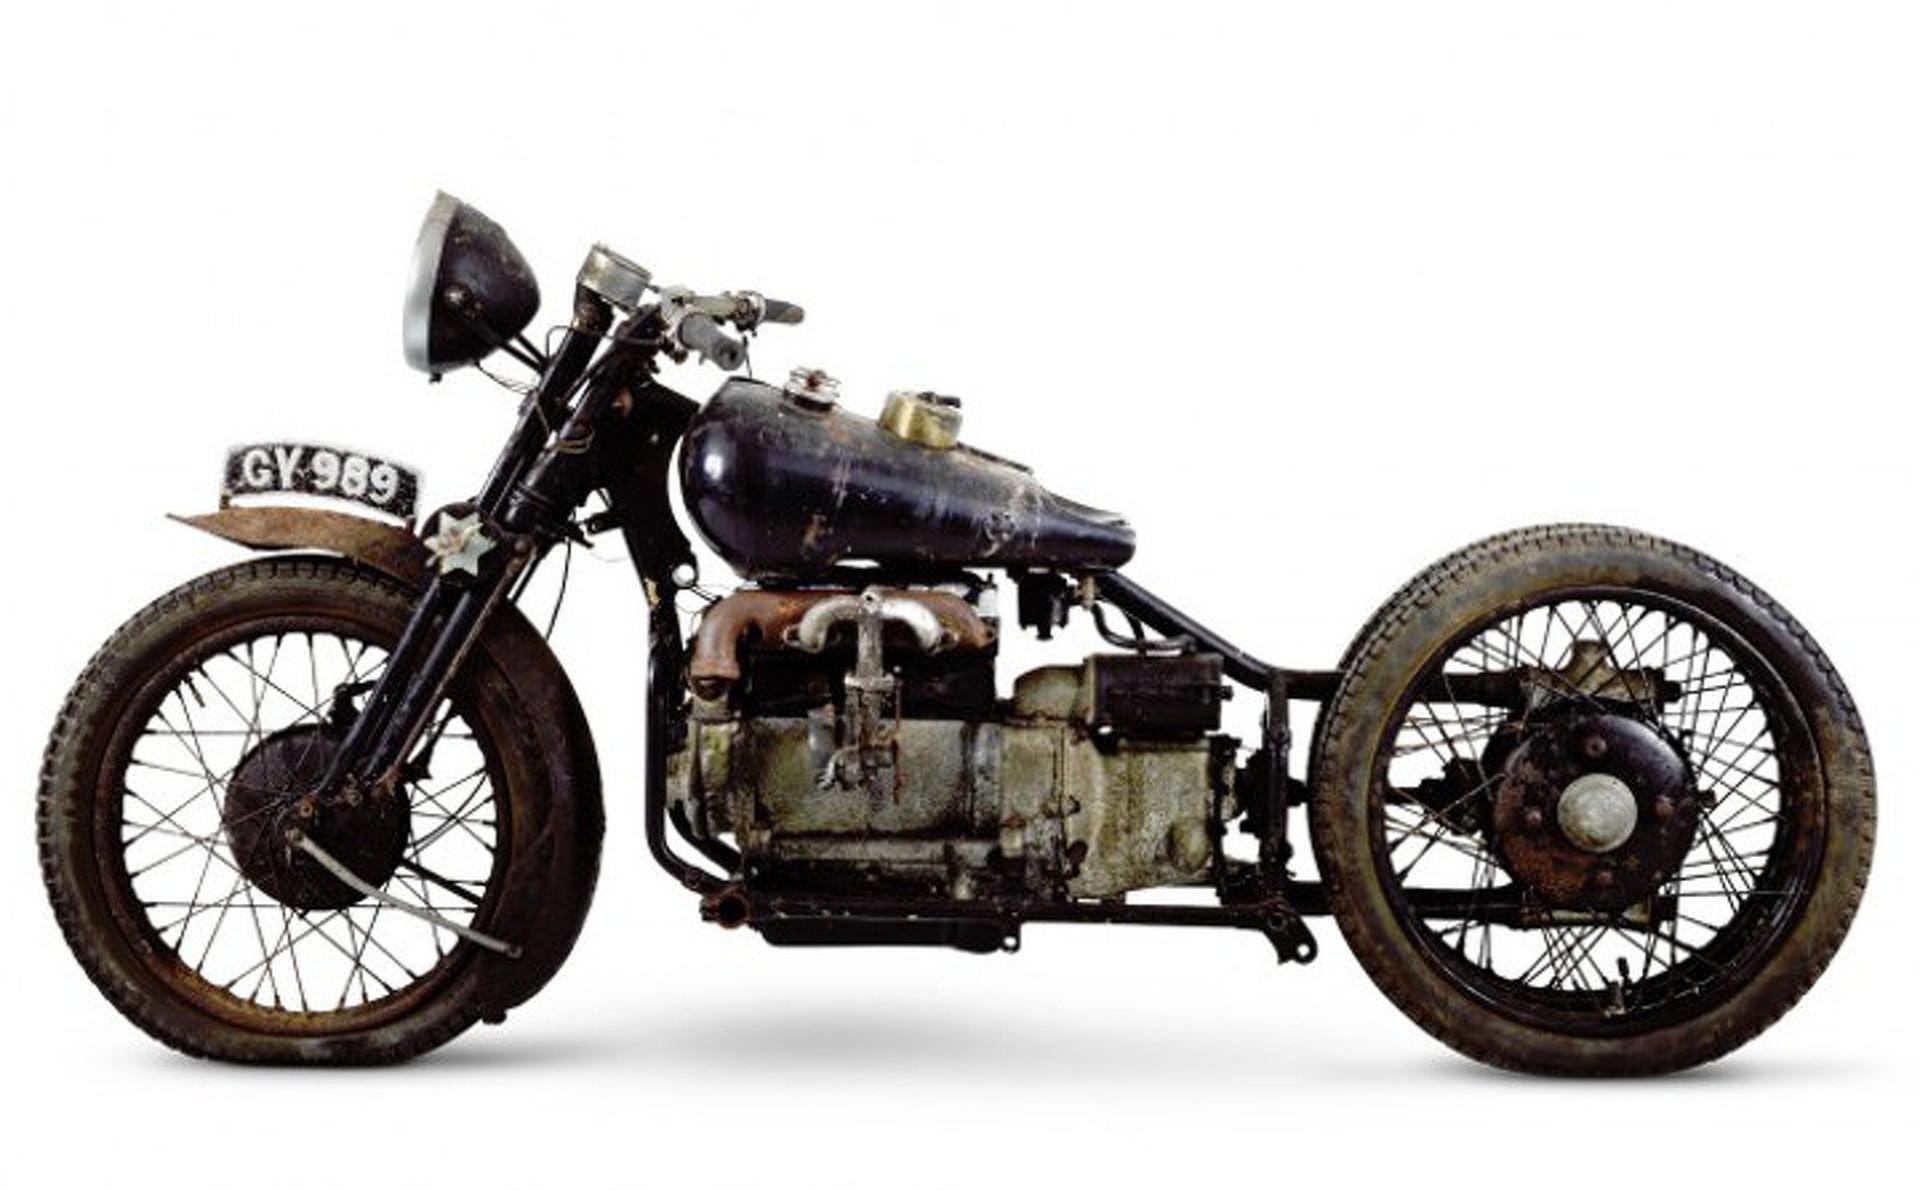 Extremely Rare 3-Wheeled British Motorcycle Heads to Bonhams Auction